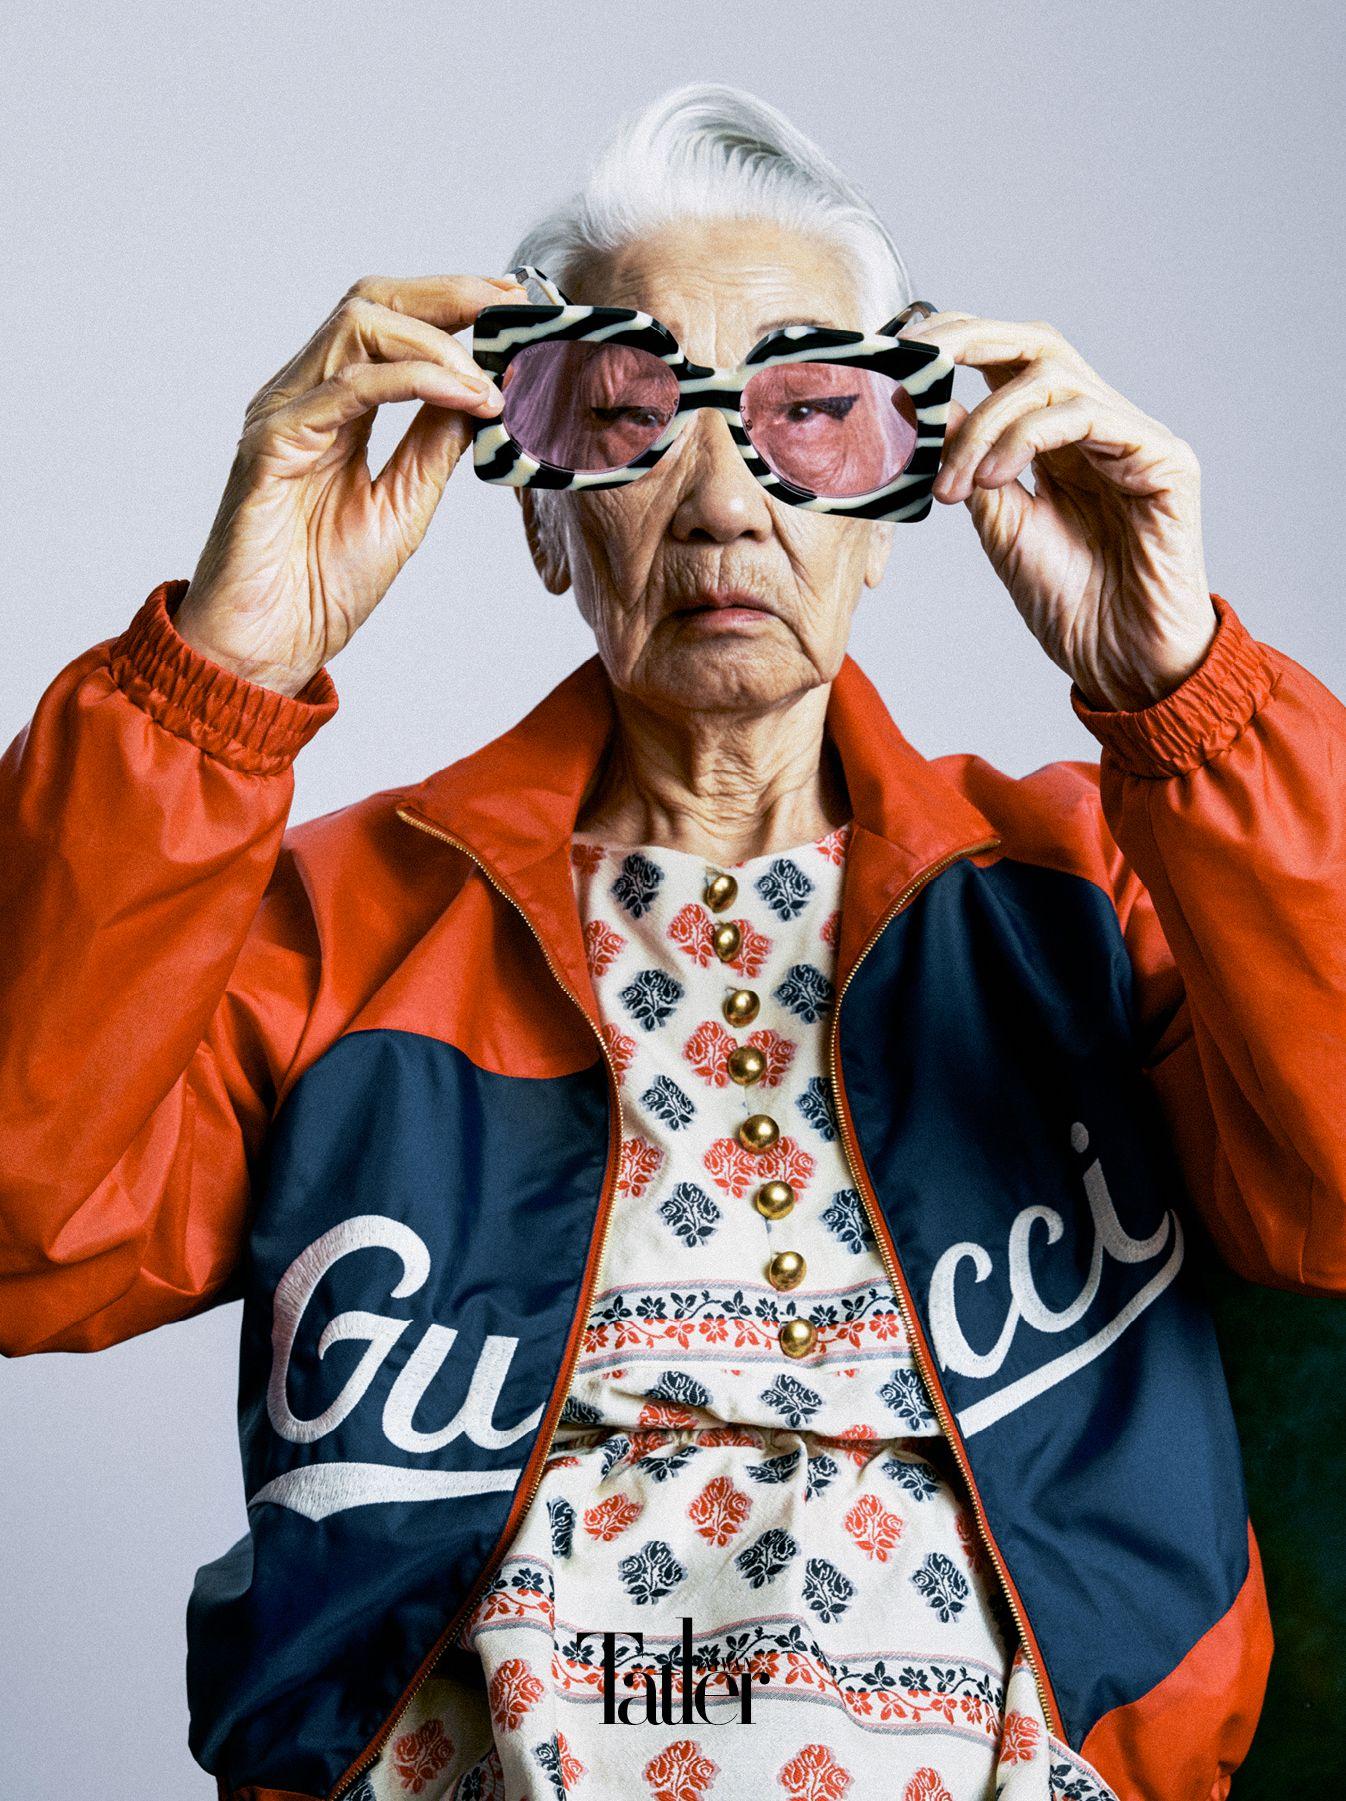 Gucci豔紅復古短夾克、紅藍印花罩衫洋裝、斑馬紋粉色鏡片太陽眼鏡,all by Gucci。